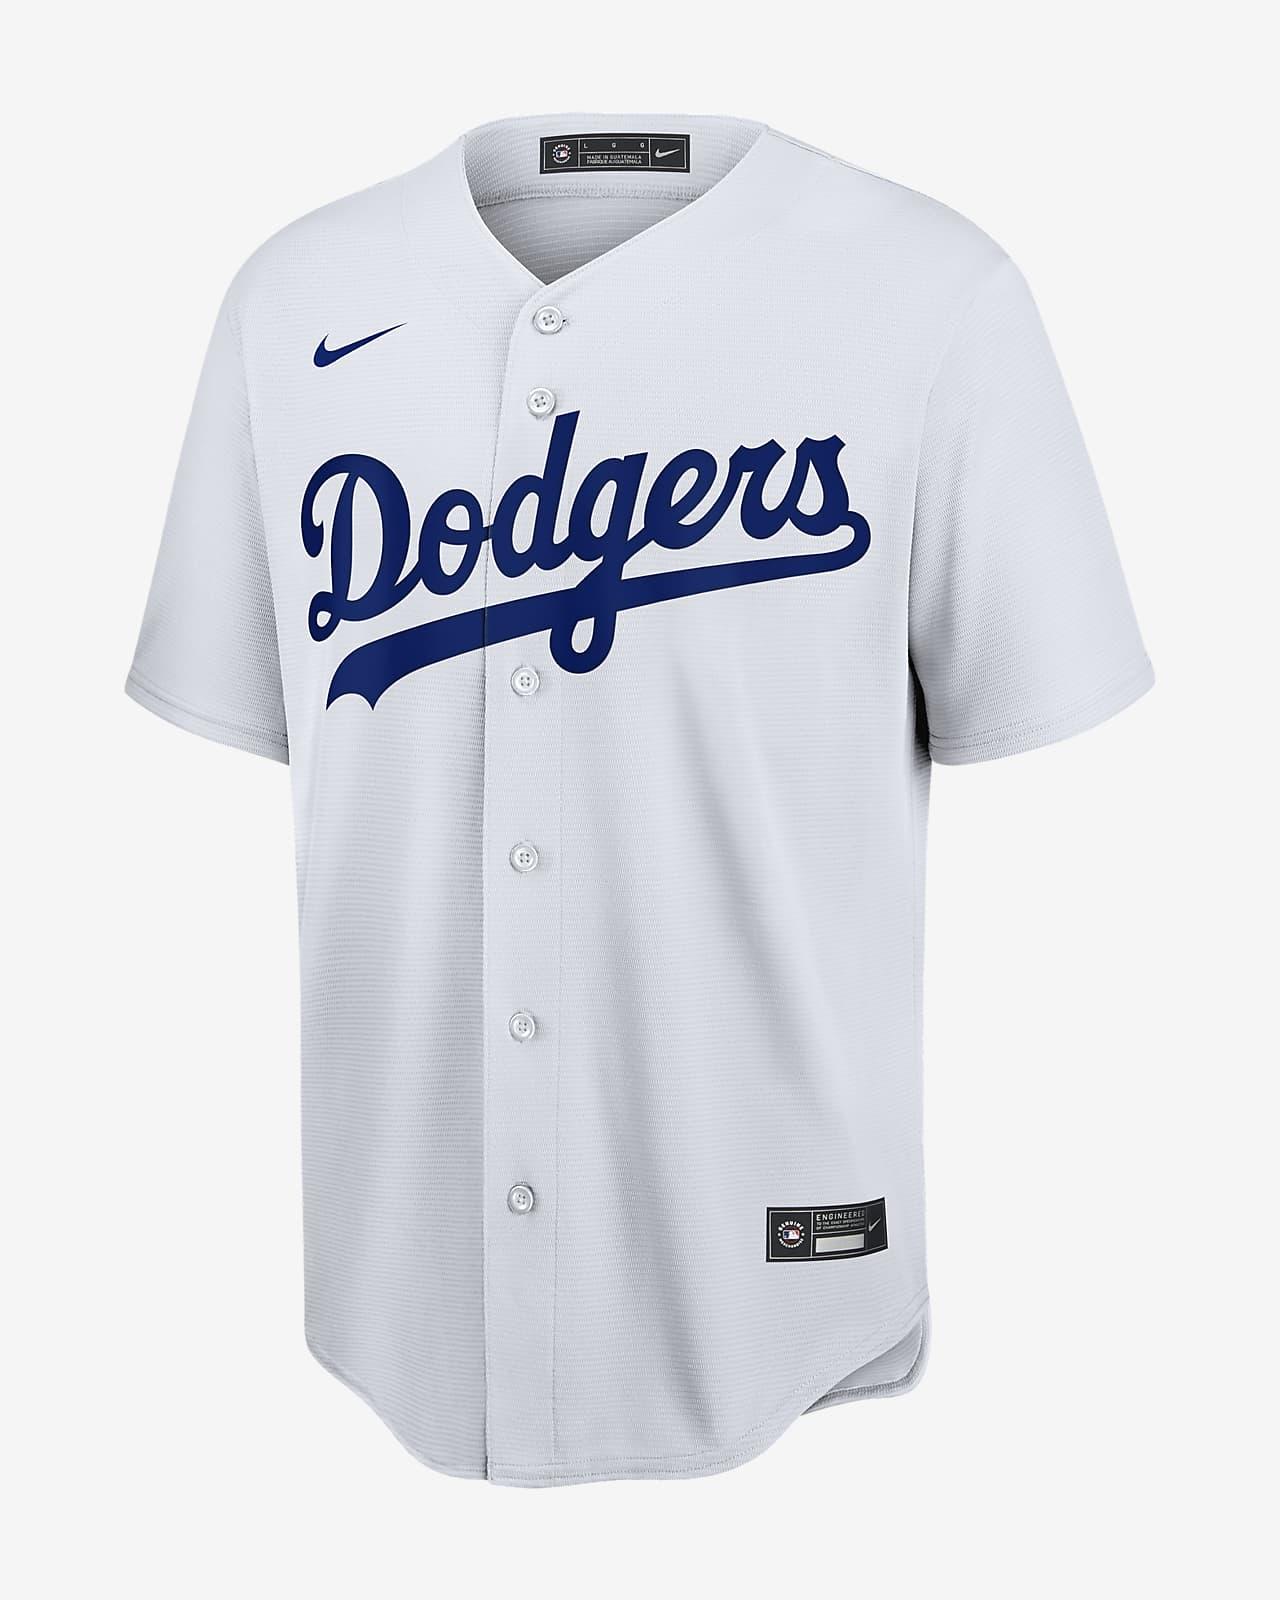 solicitud Física Oficial  Camiseta de béisbol Replica para hombre MLB Los Angeles Dodgers. Nike.com